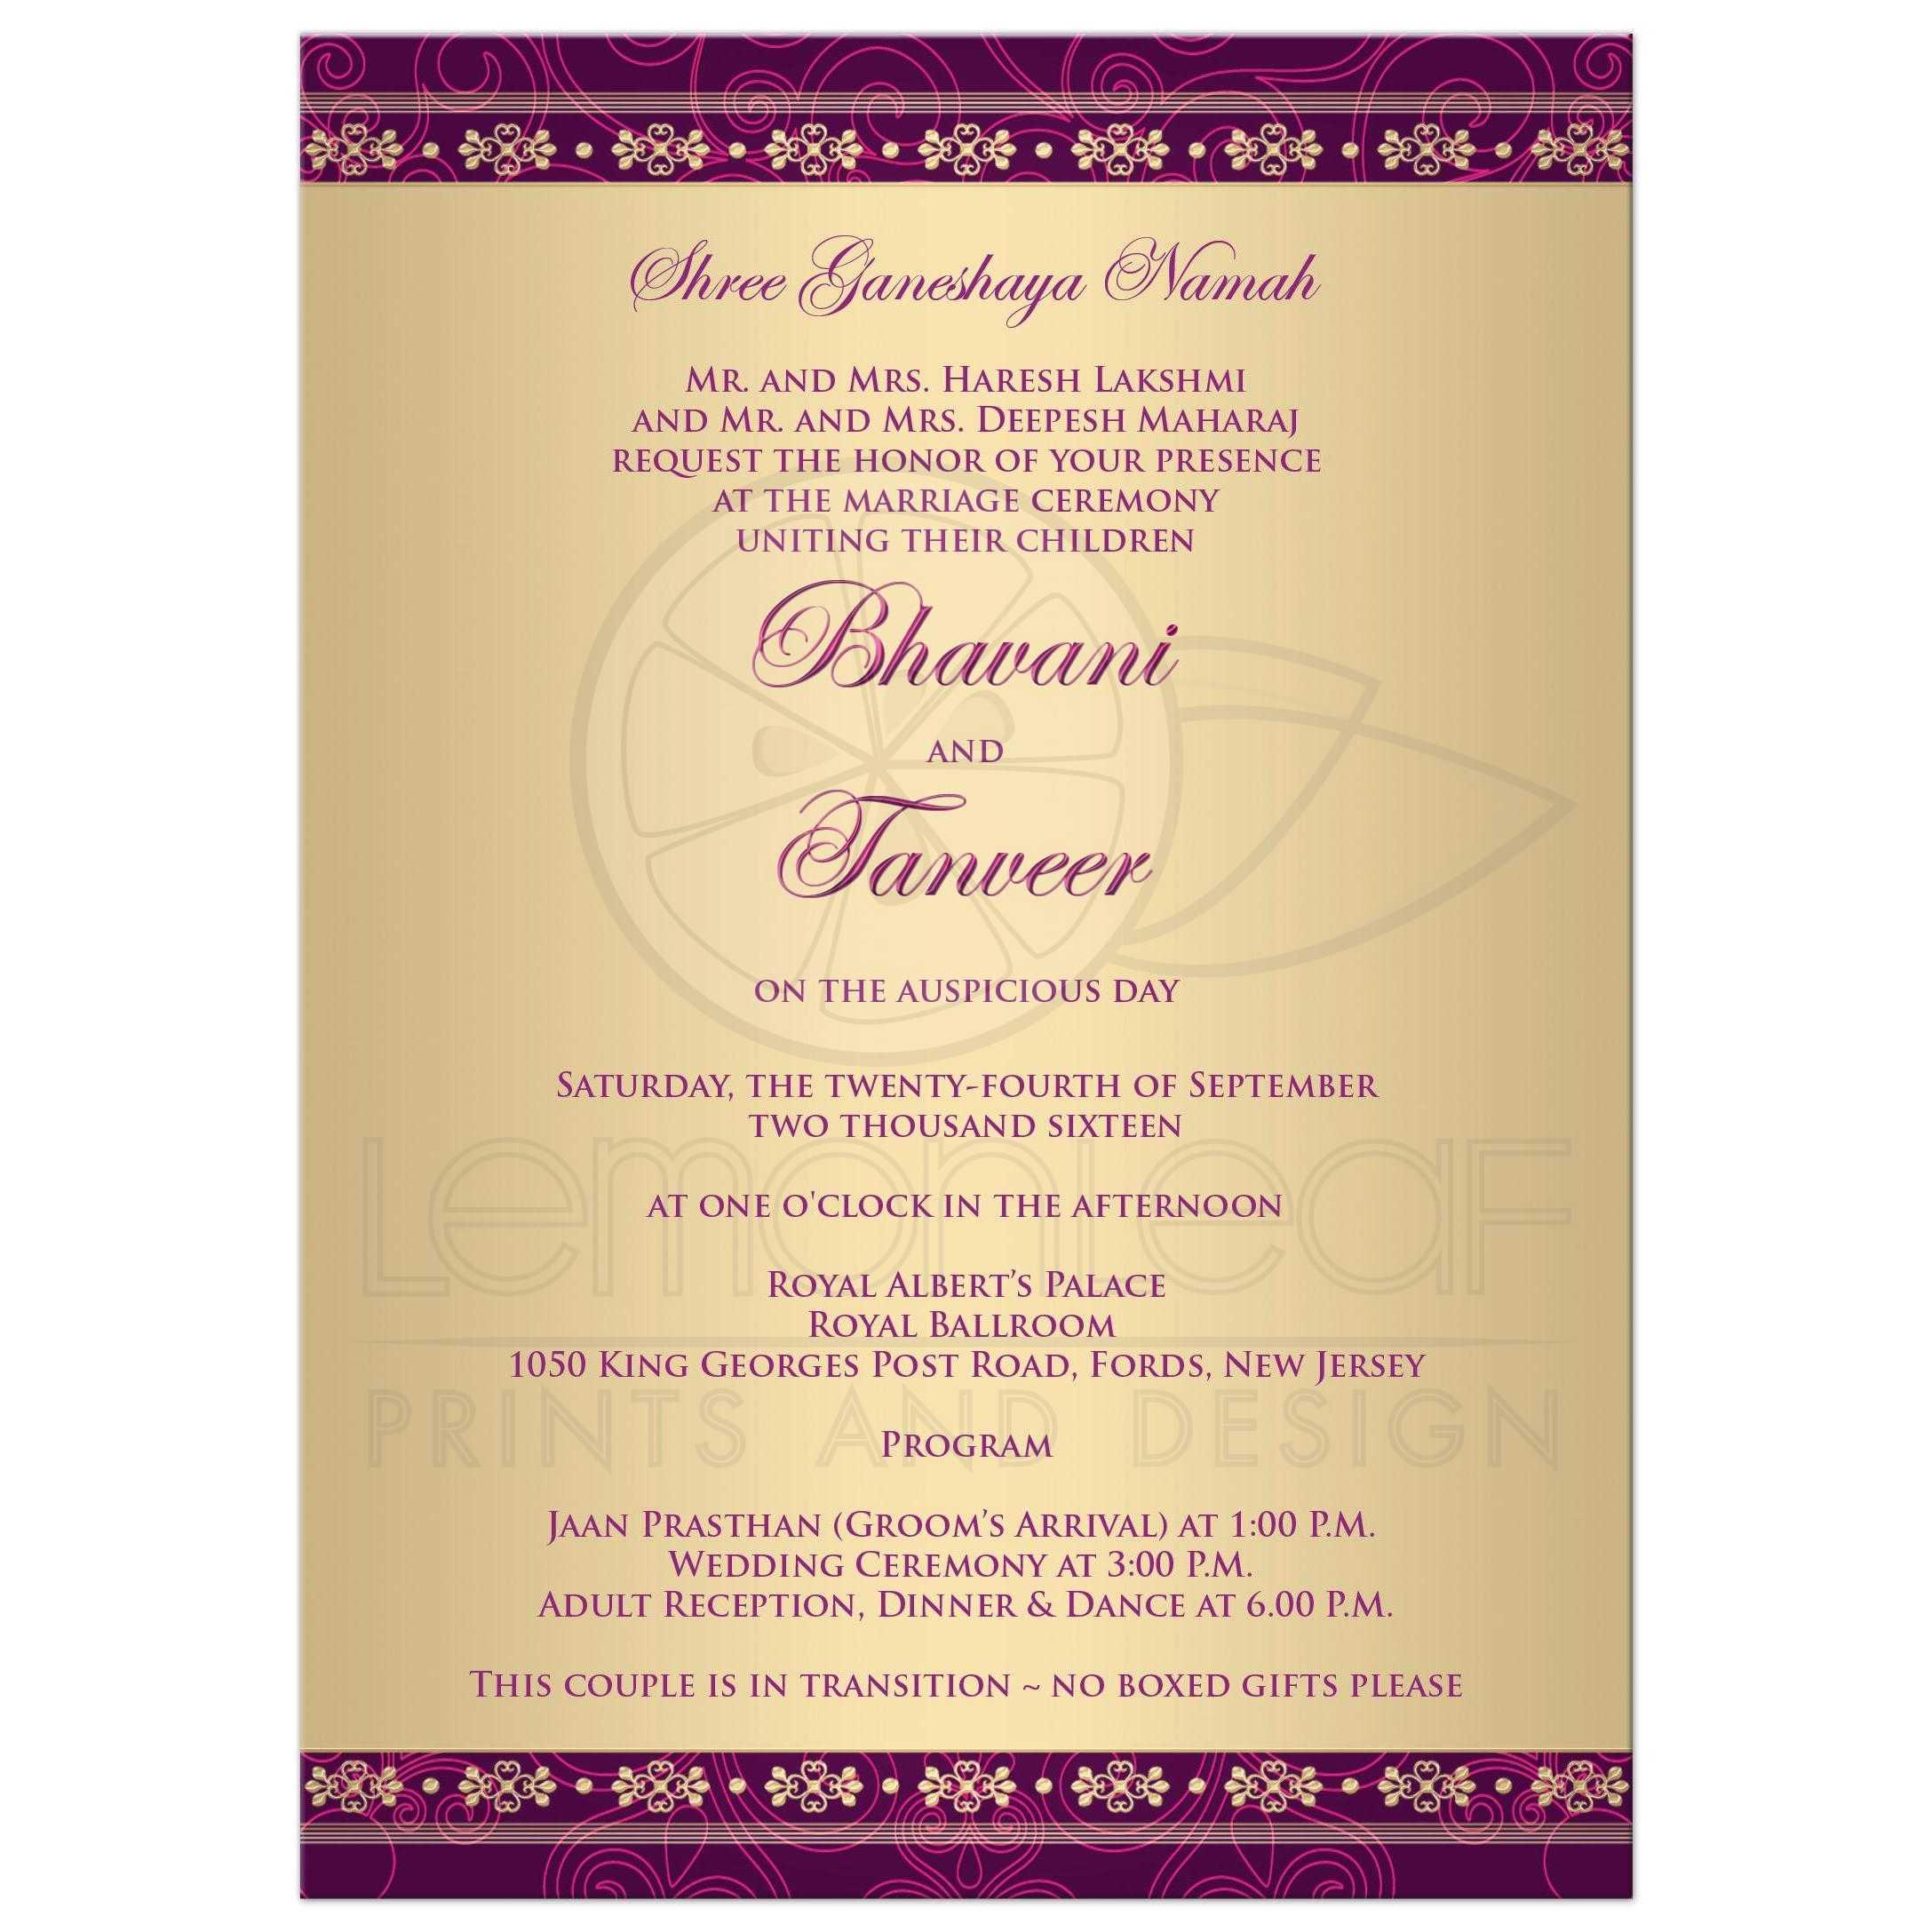 Indian wedding invitations wordings sles 28 images indian wording for marriage wedding invitation ideas indian filmwisefo